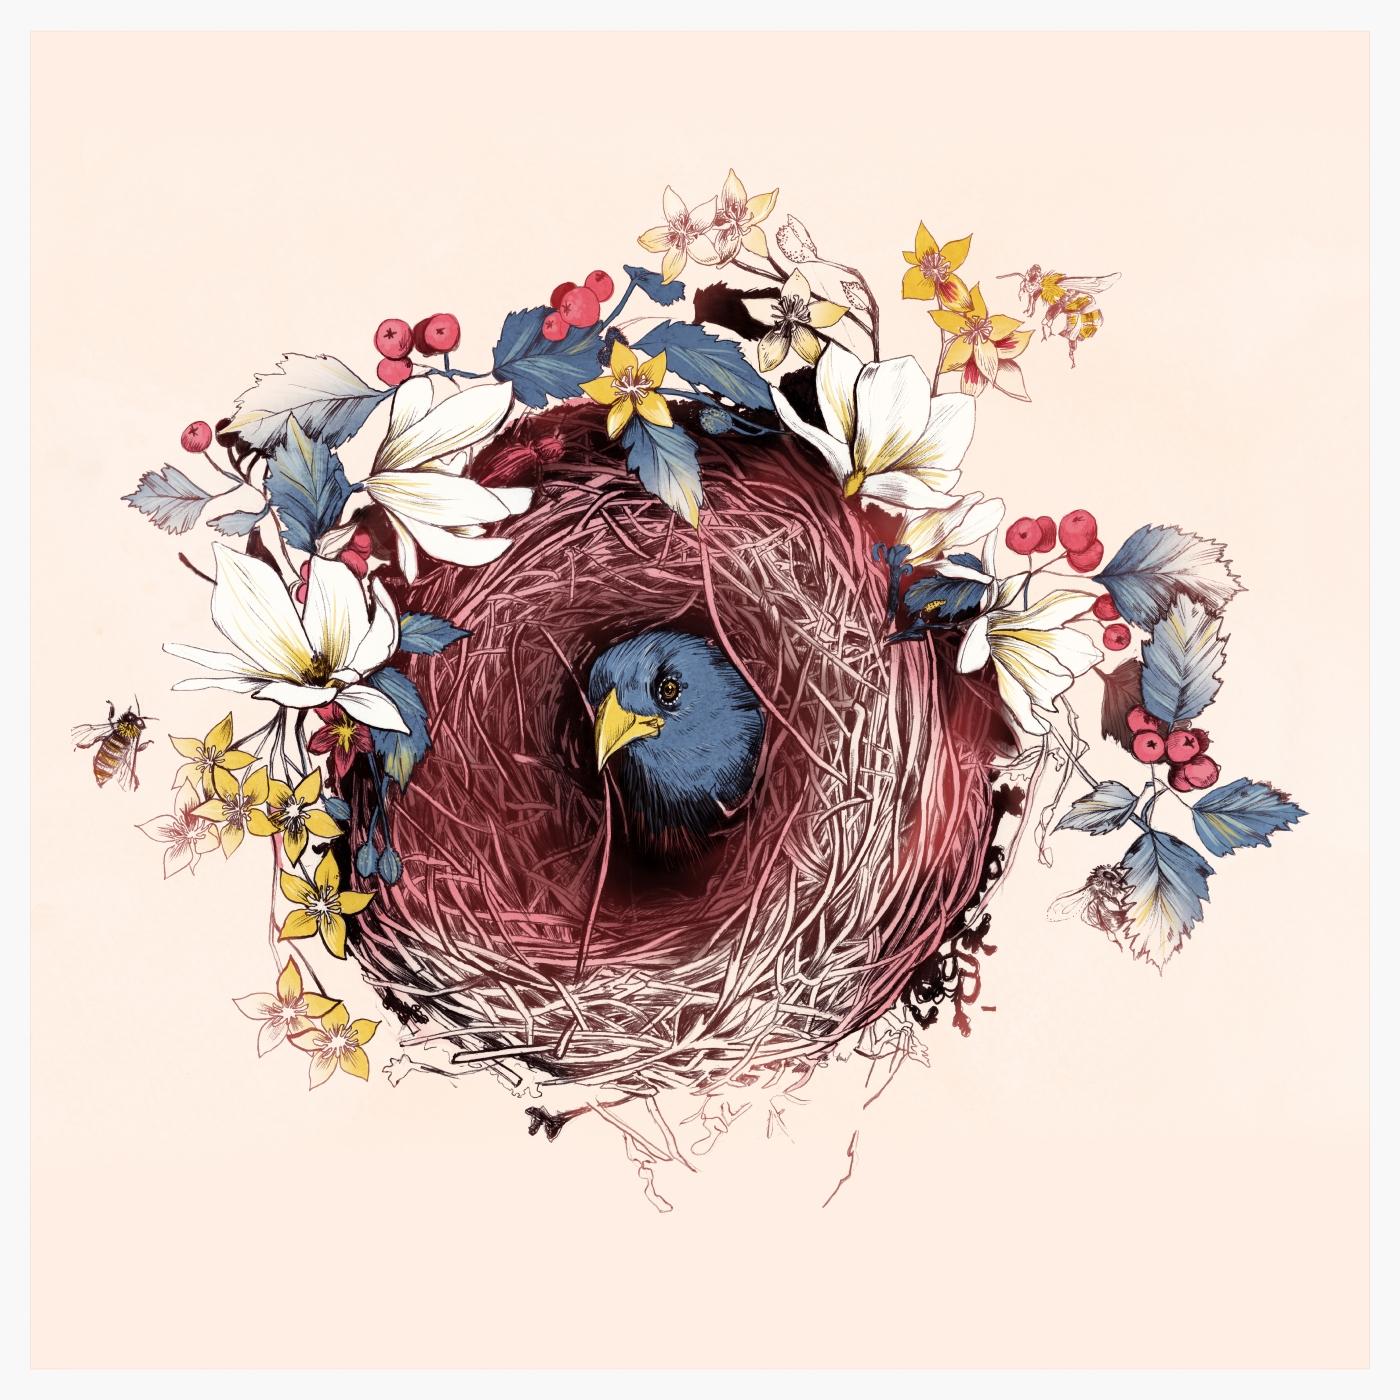 fig. 1. Nesting